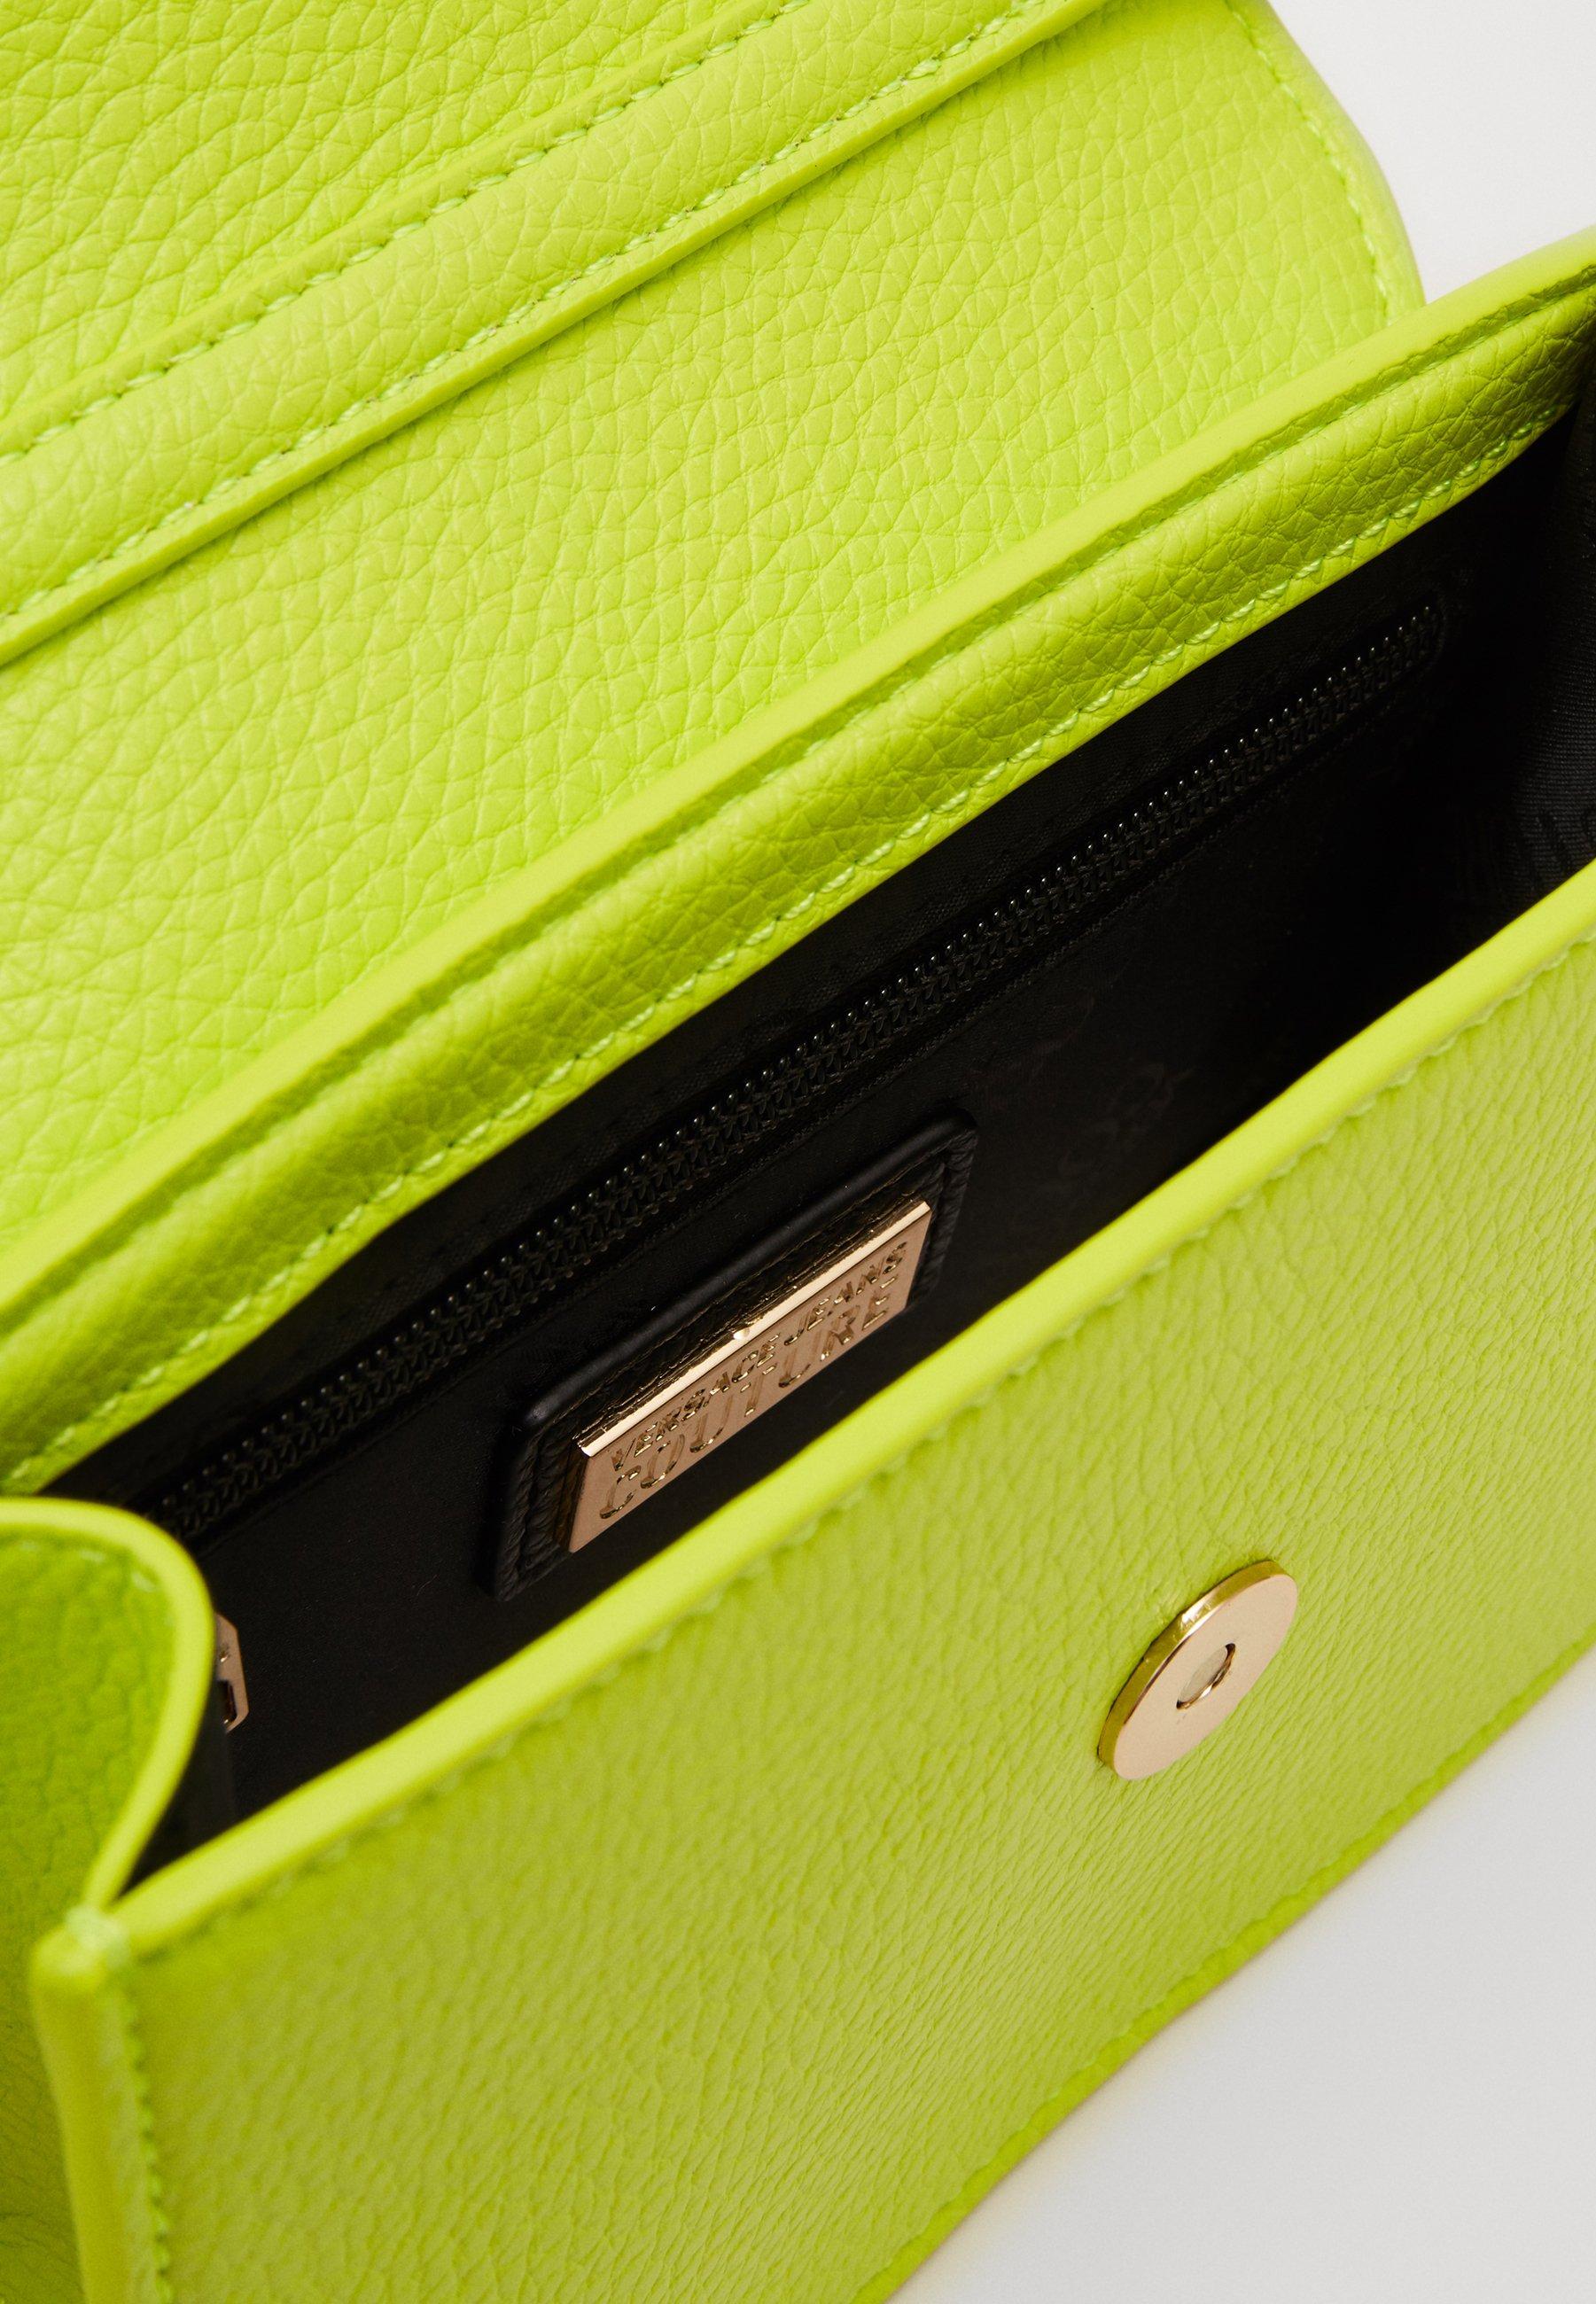 Cheapest Outlet Versace Jeans Couture DISCOBAGCOUTURE  - Across body bag - verde fluo | women's accessories 2020 iezuj